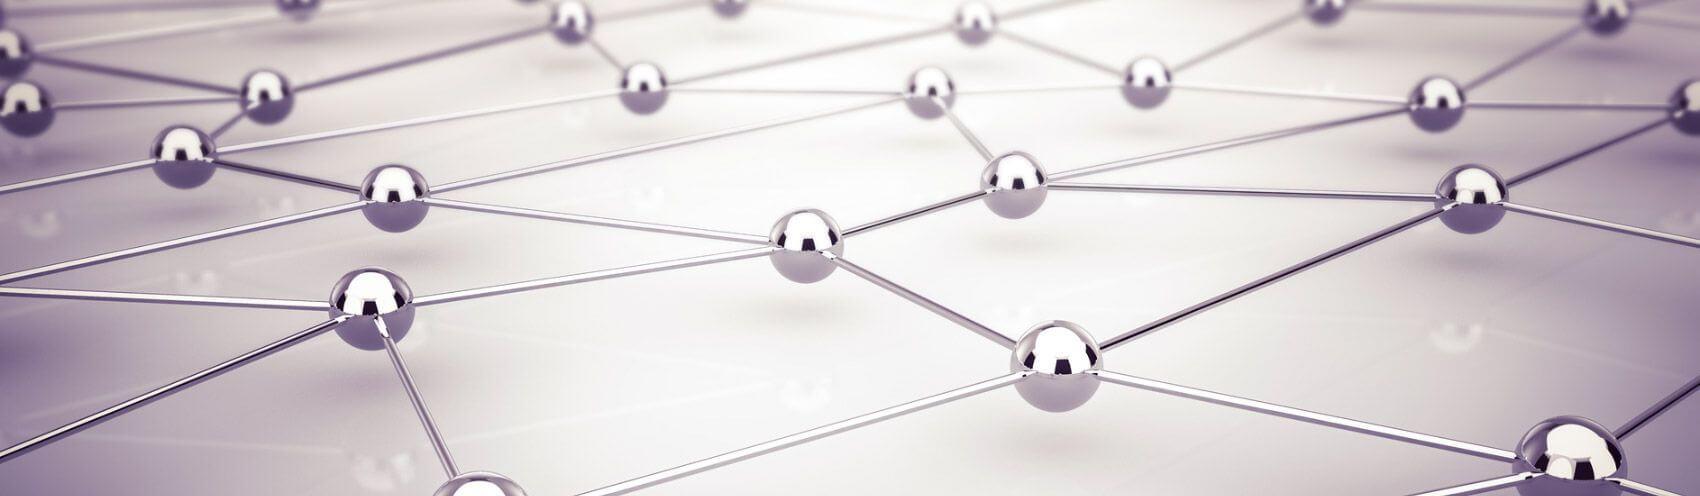 web site network